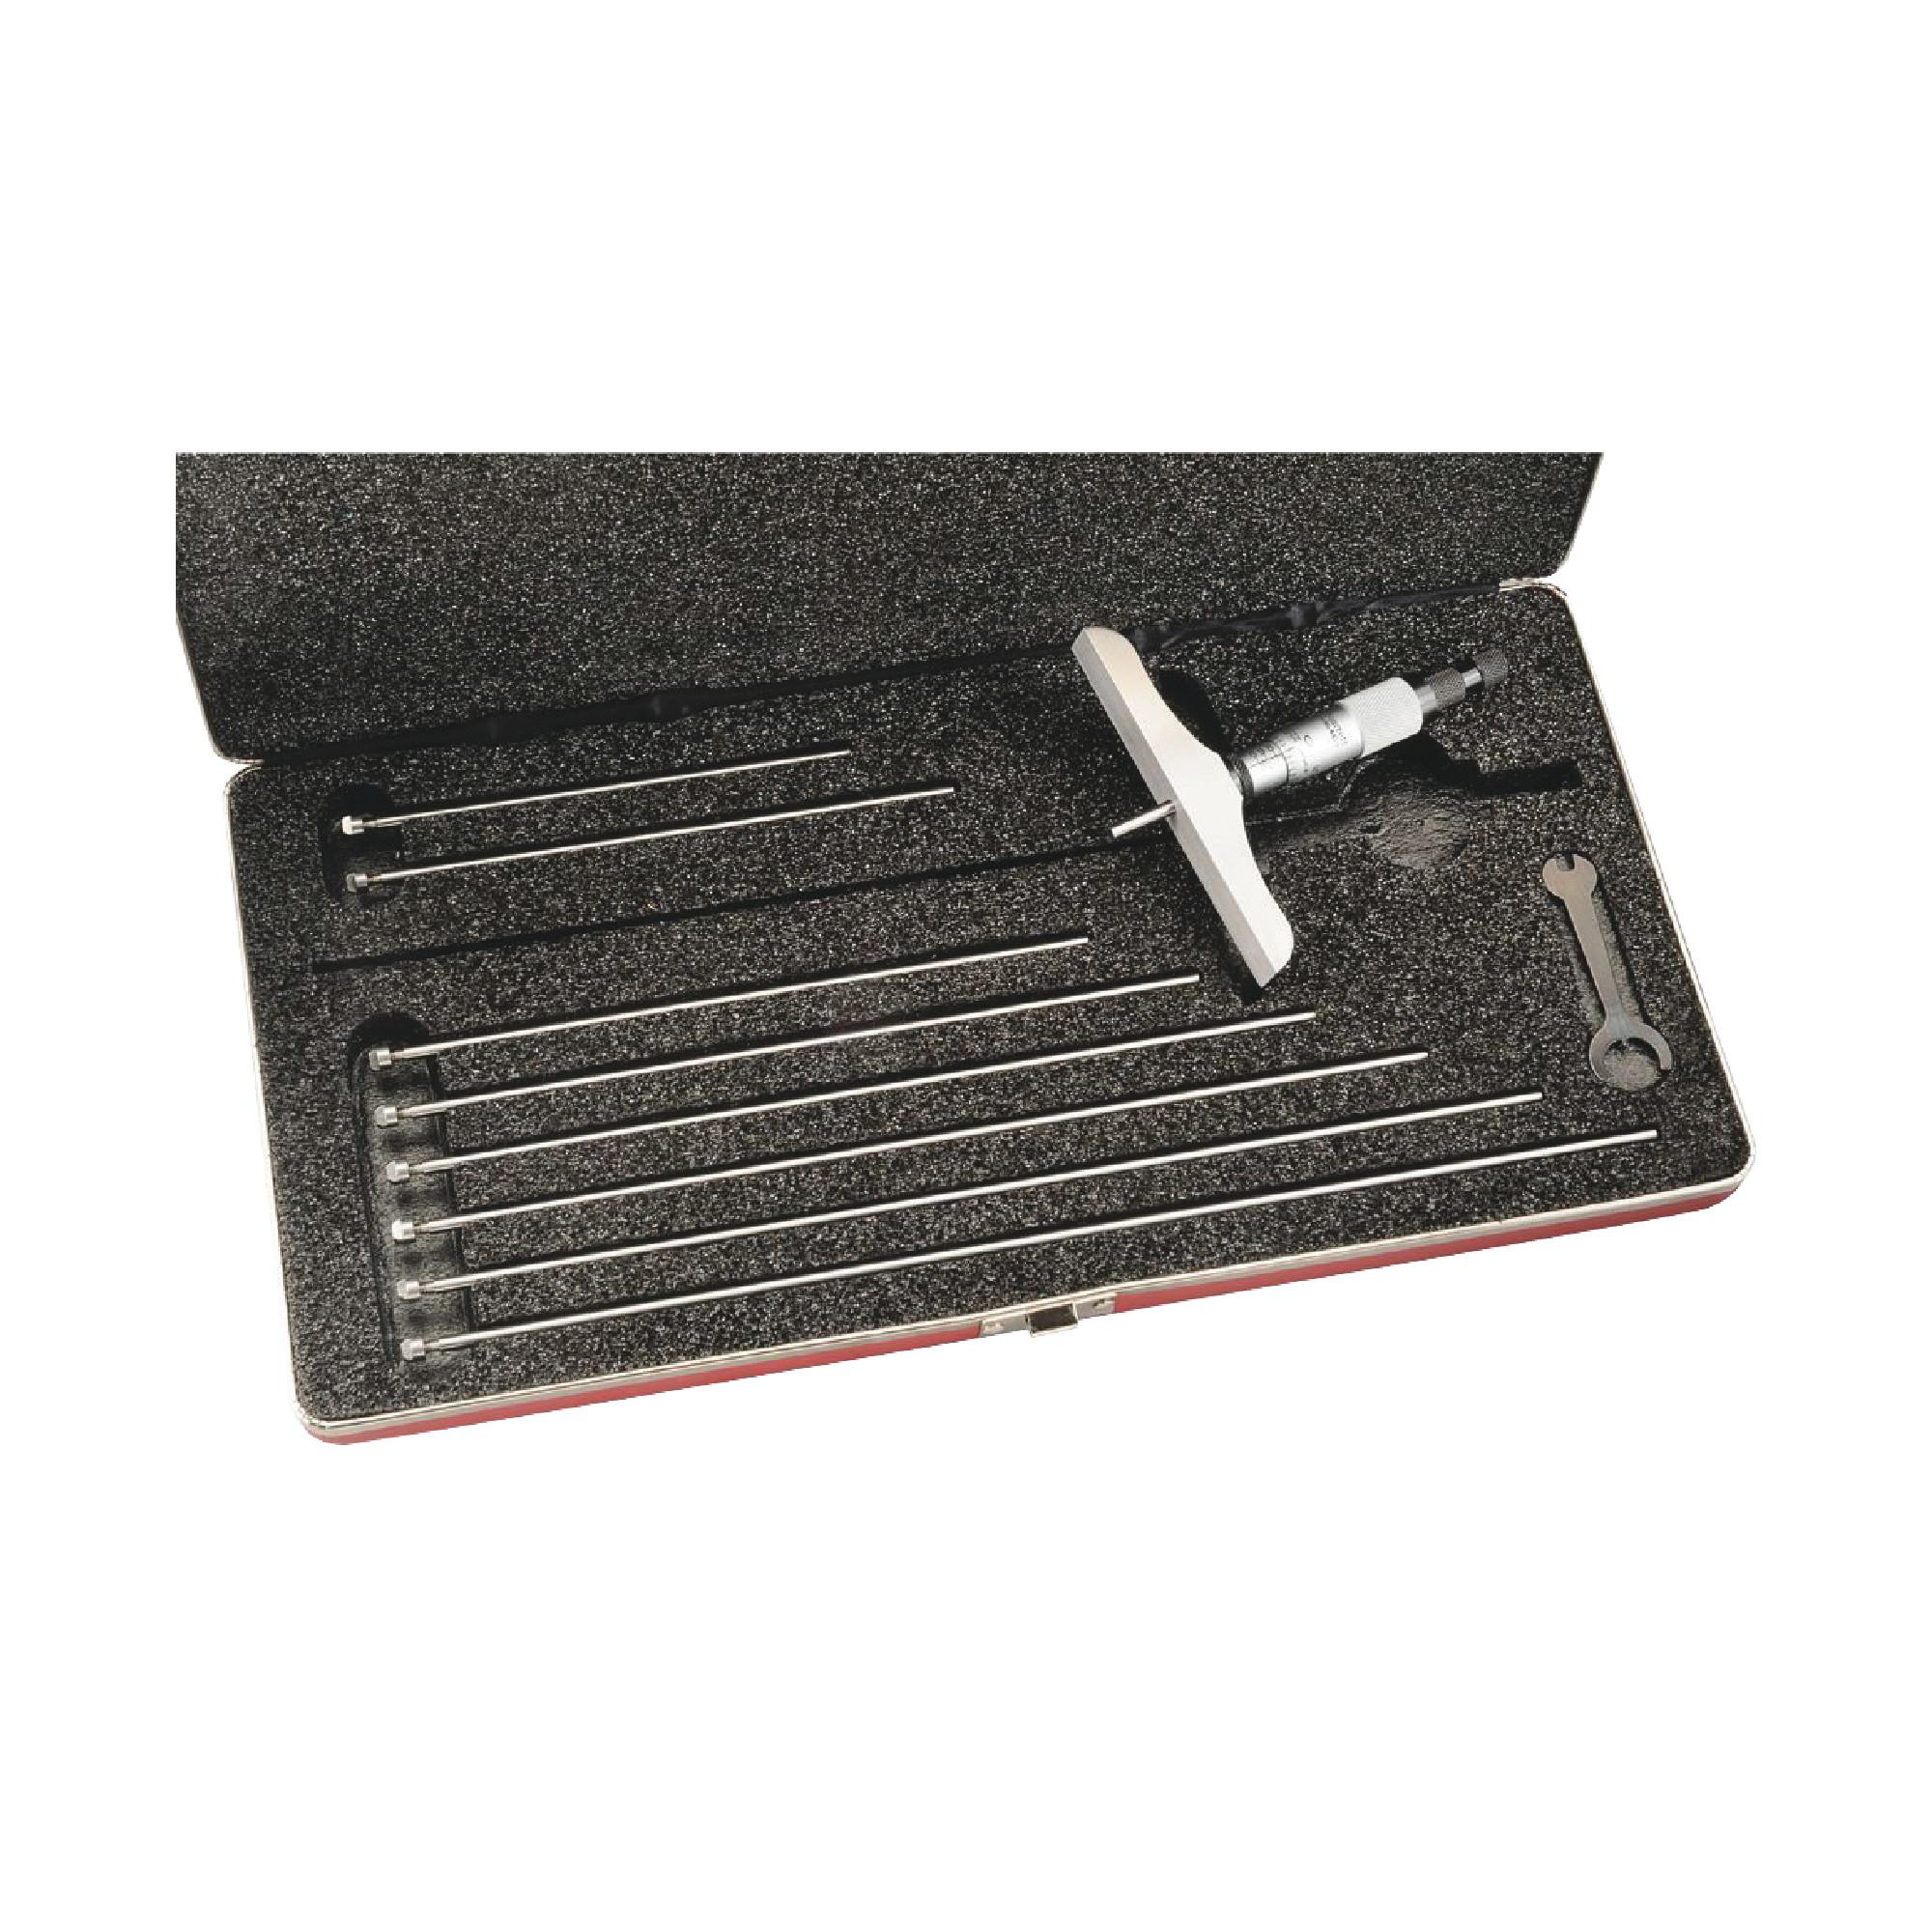 Depth Gage Micrometer Sets